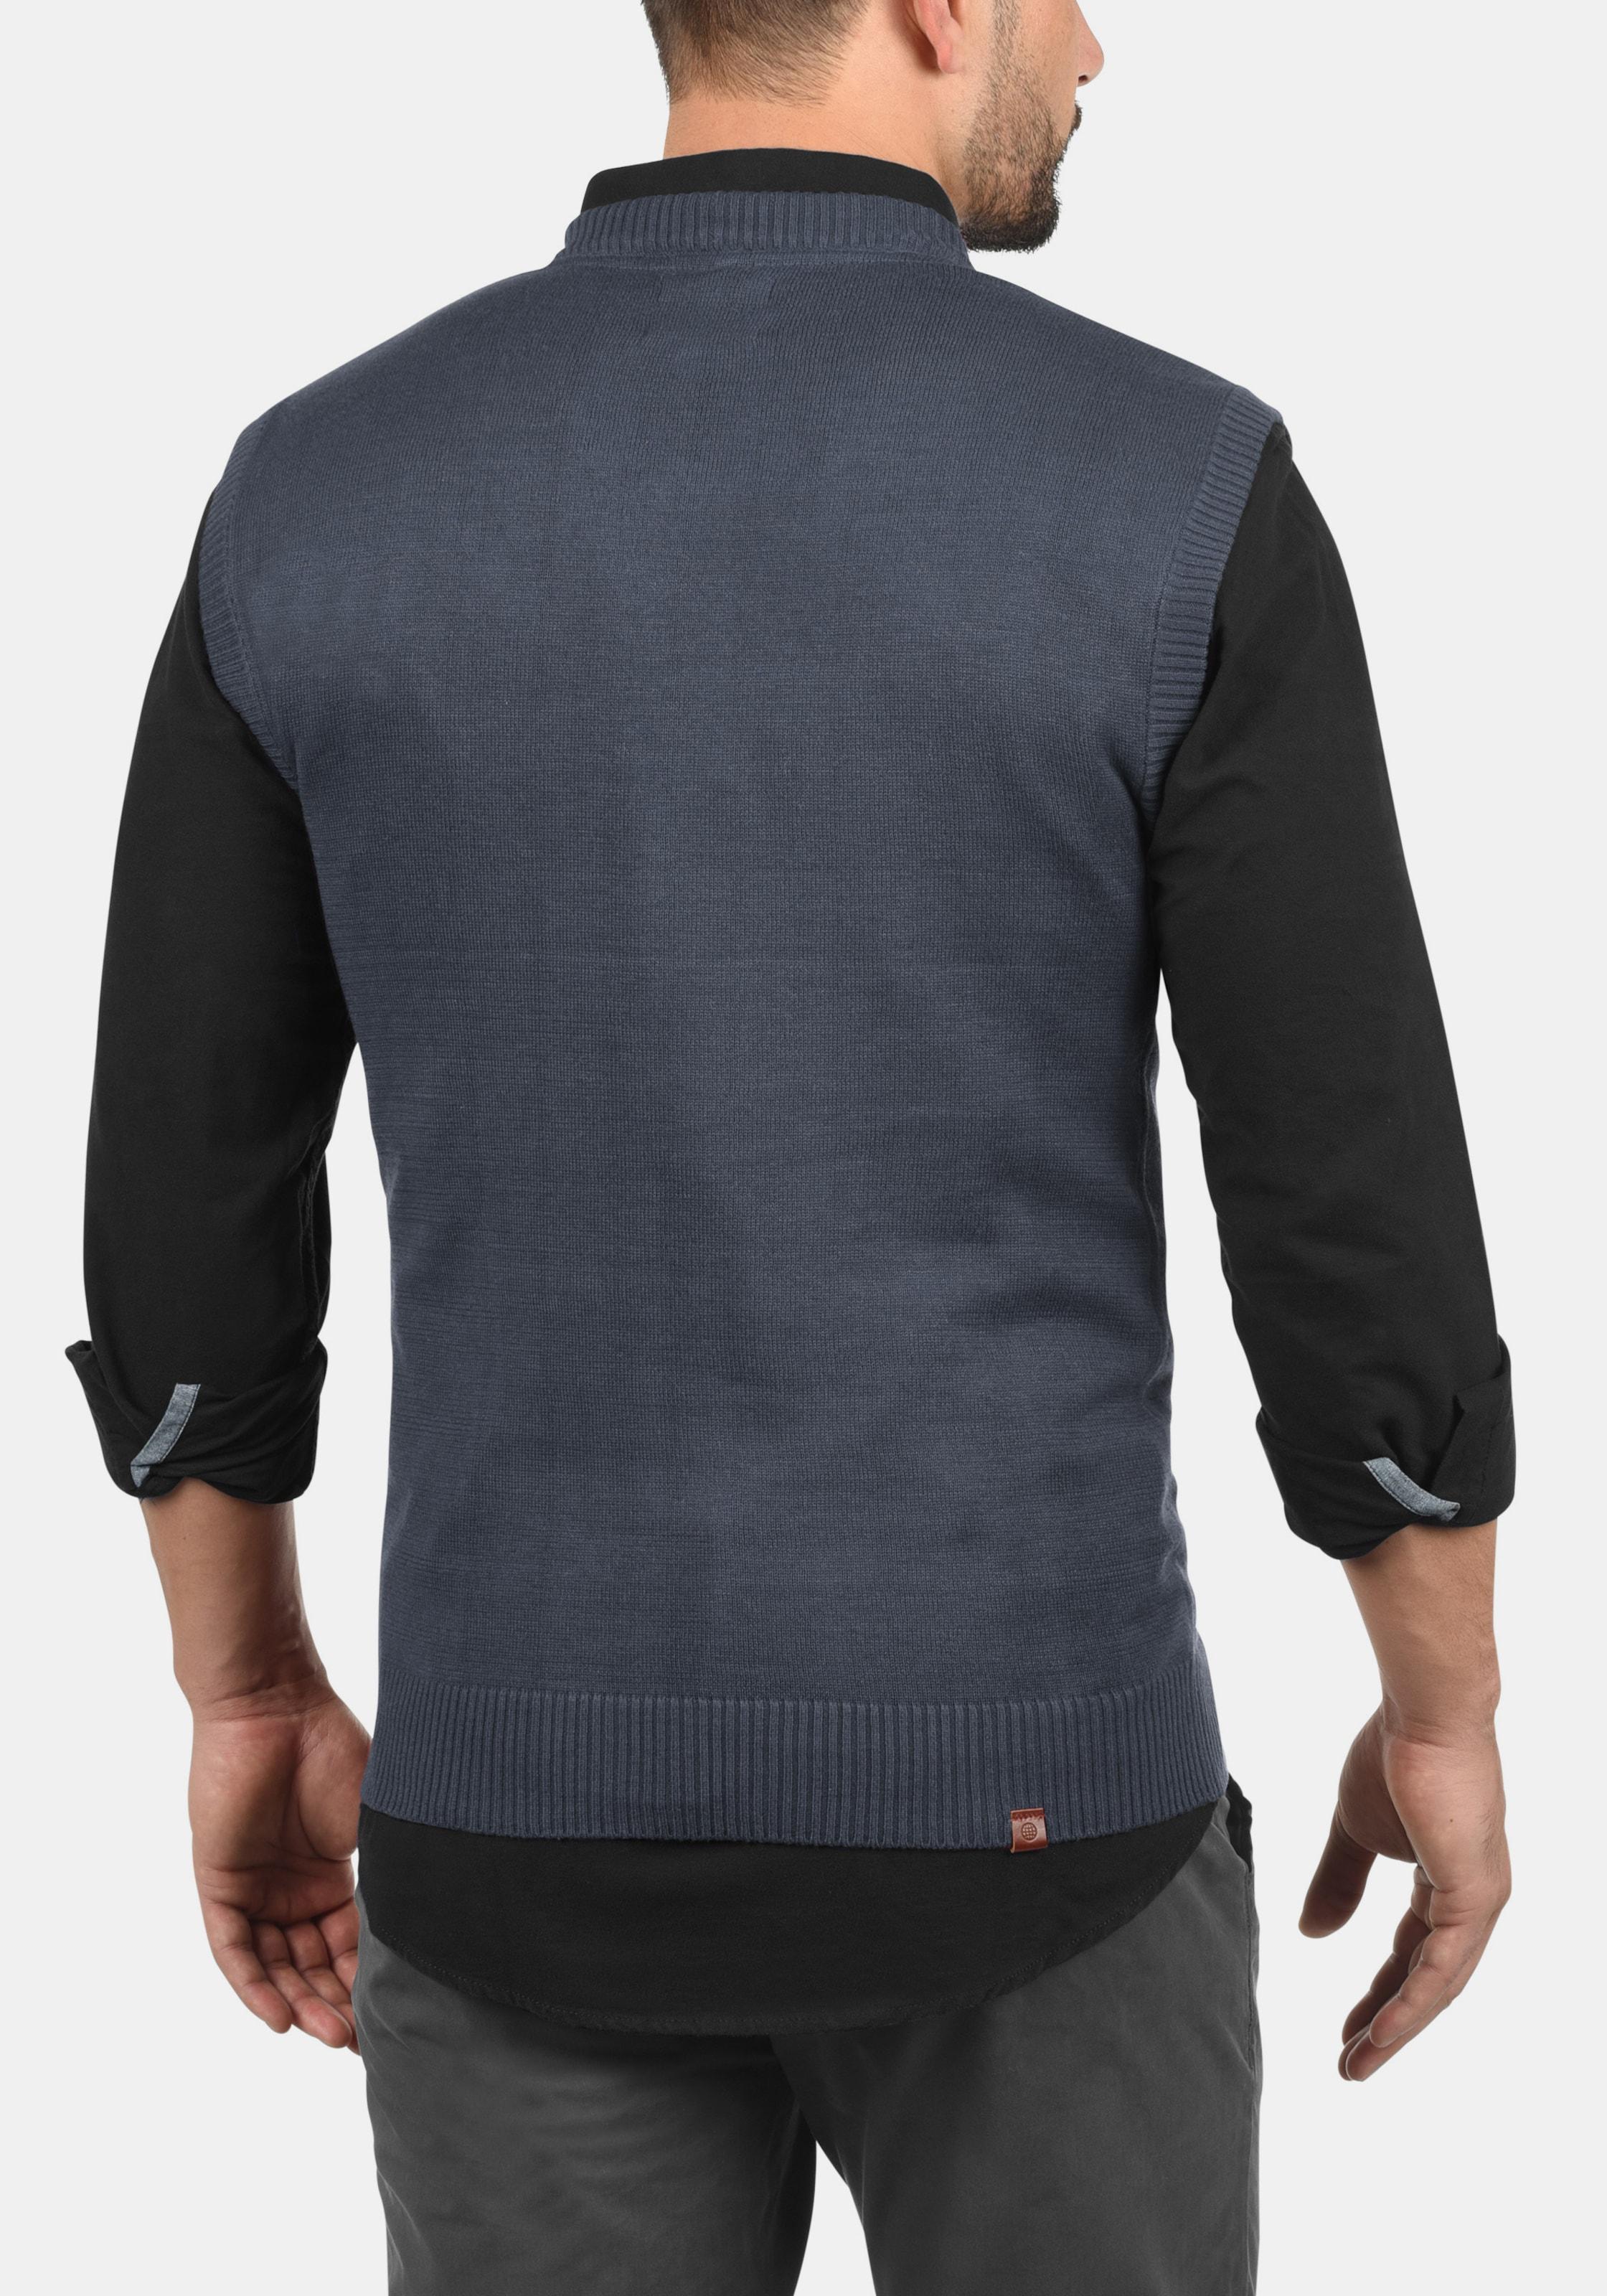 Blend pullover In V ausschnitt BlauDunkelblau 'larsson' ynO8vN0wmP